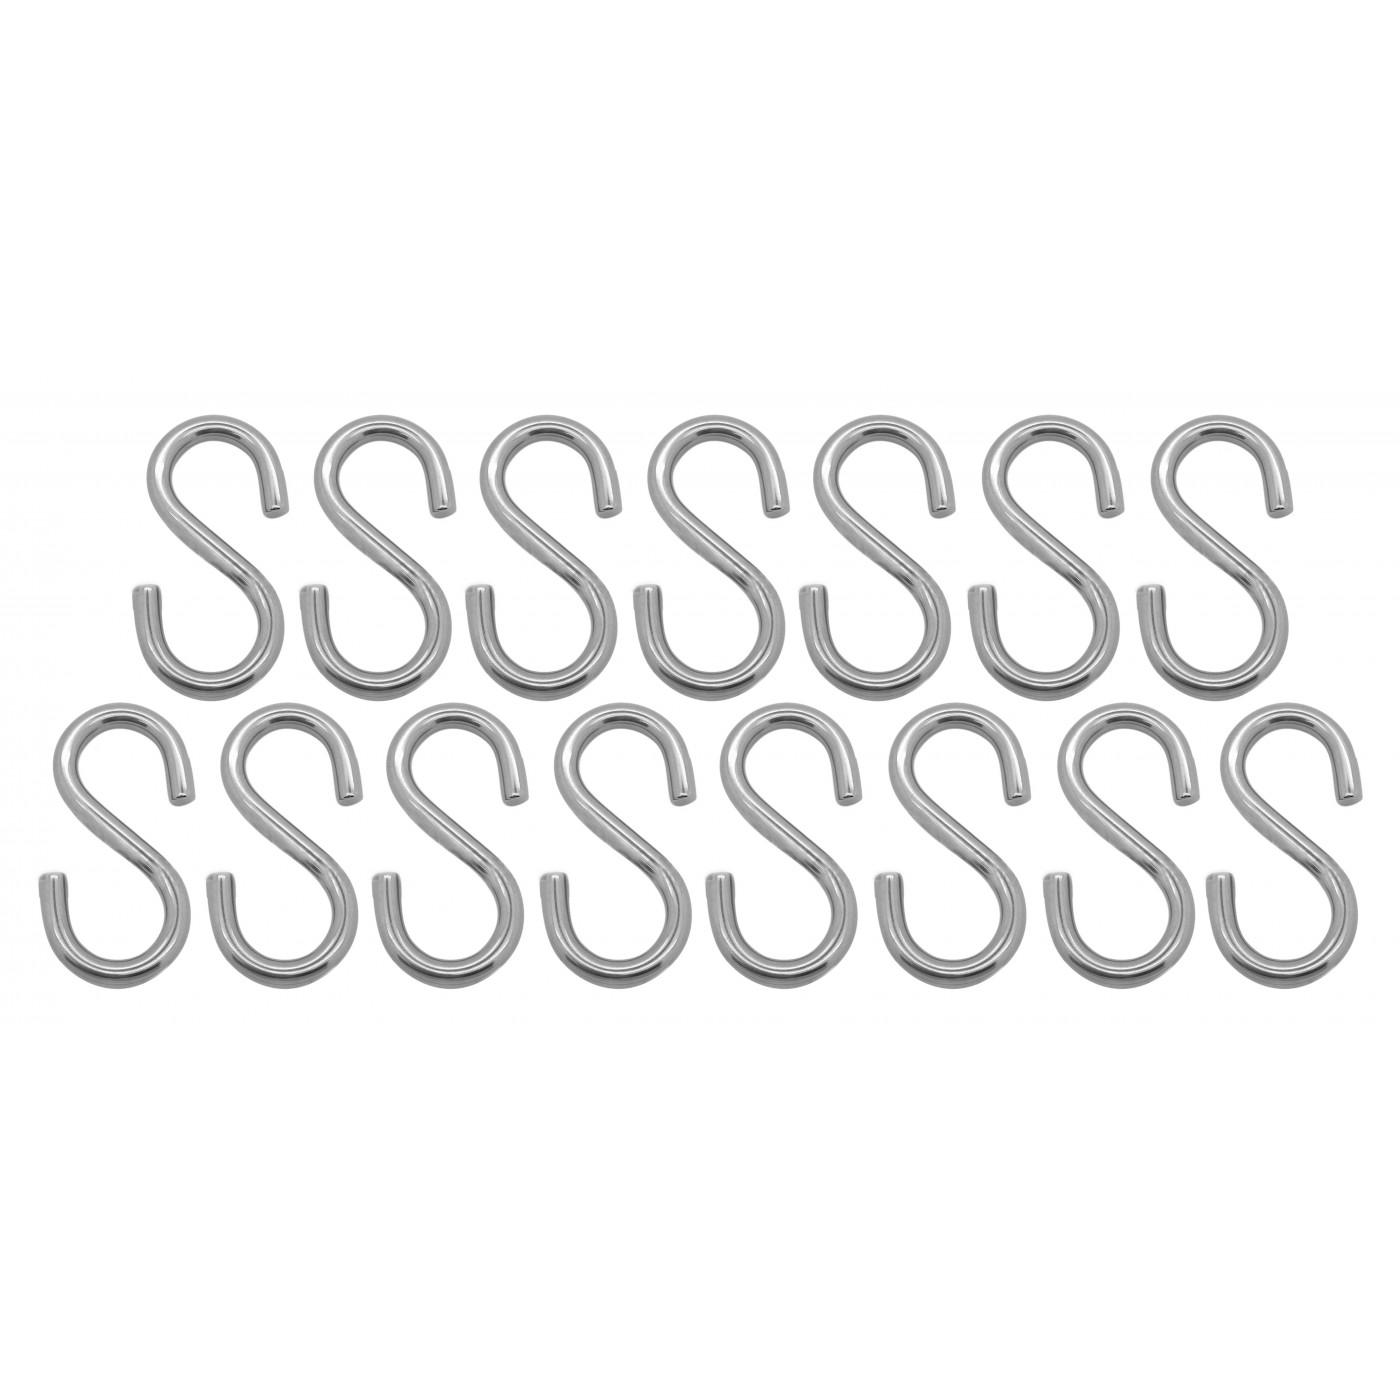 Jeu de 15 crochets en S solides en acier (74 mm, 50 kg)  - 1